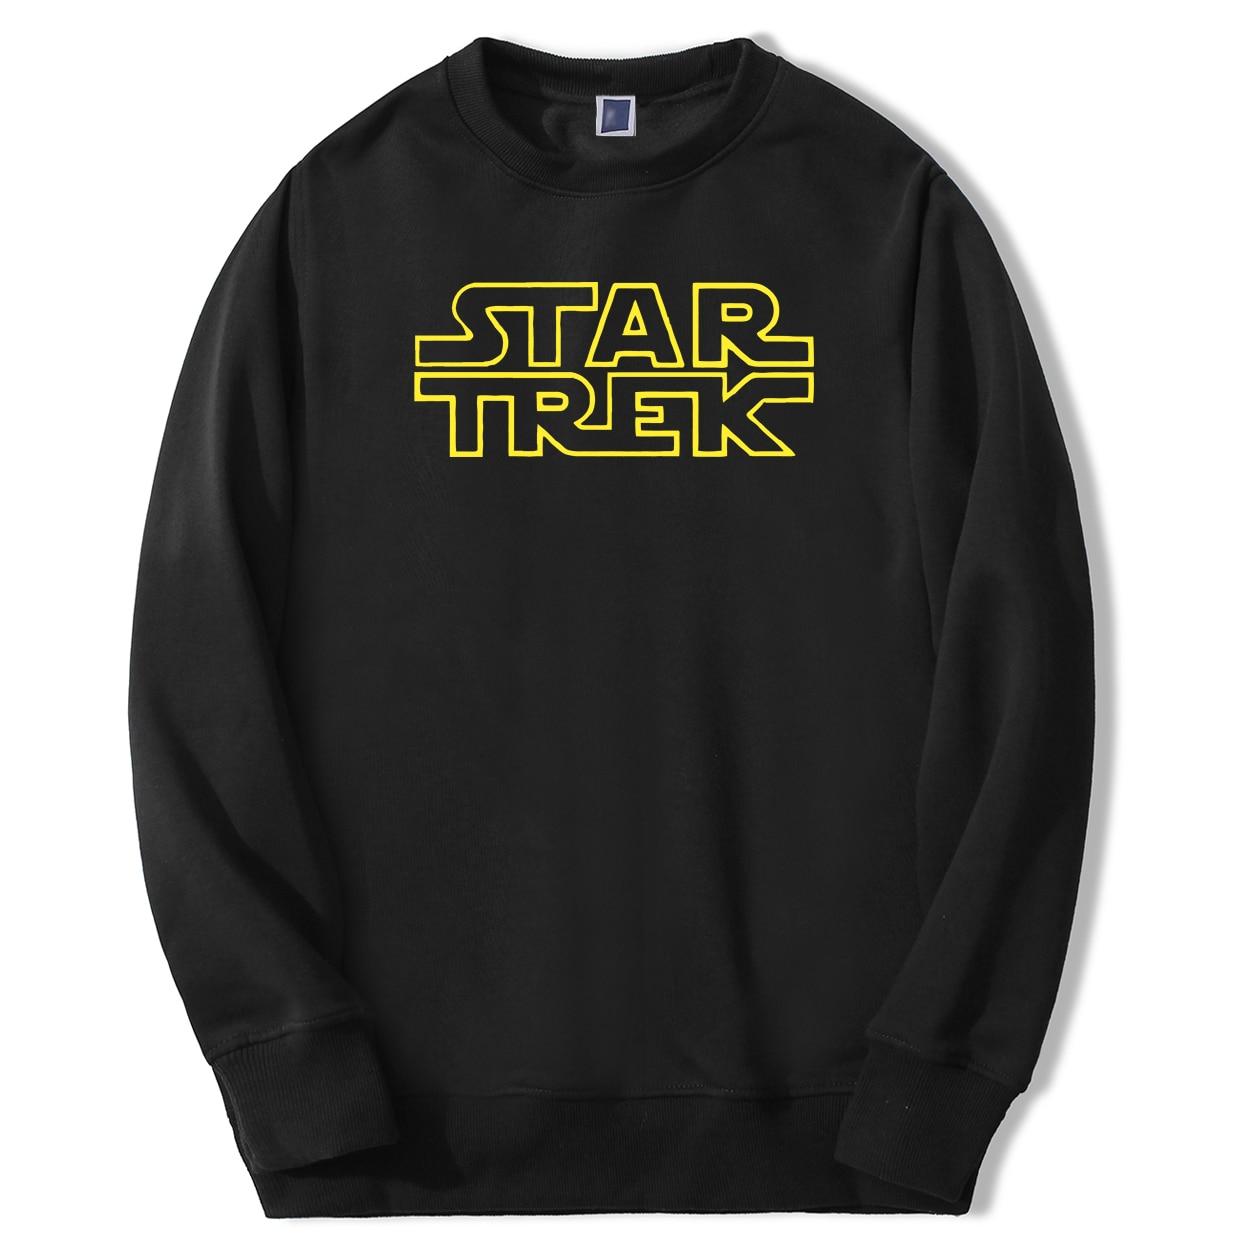 Star Trek Men's Sweatshirts Startrek Male Hoodies Sweatshirts 2020 Spring Autumn Fashion Starwars Hoodies Sweatshirt Man Tops